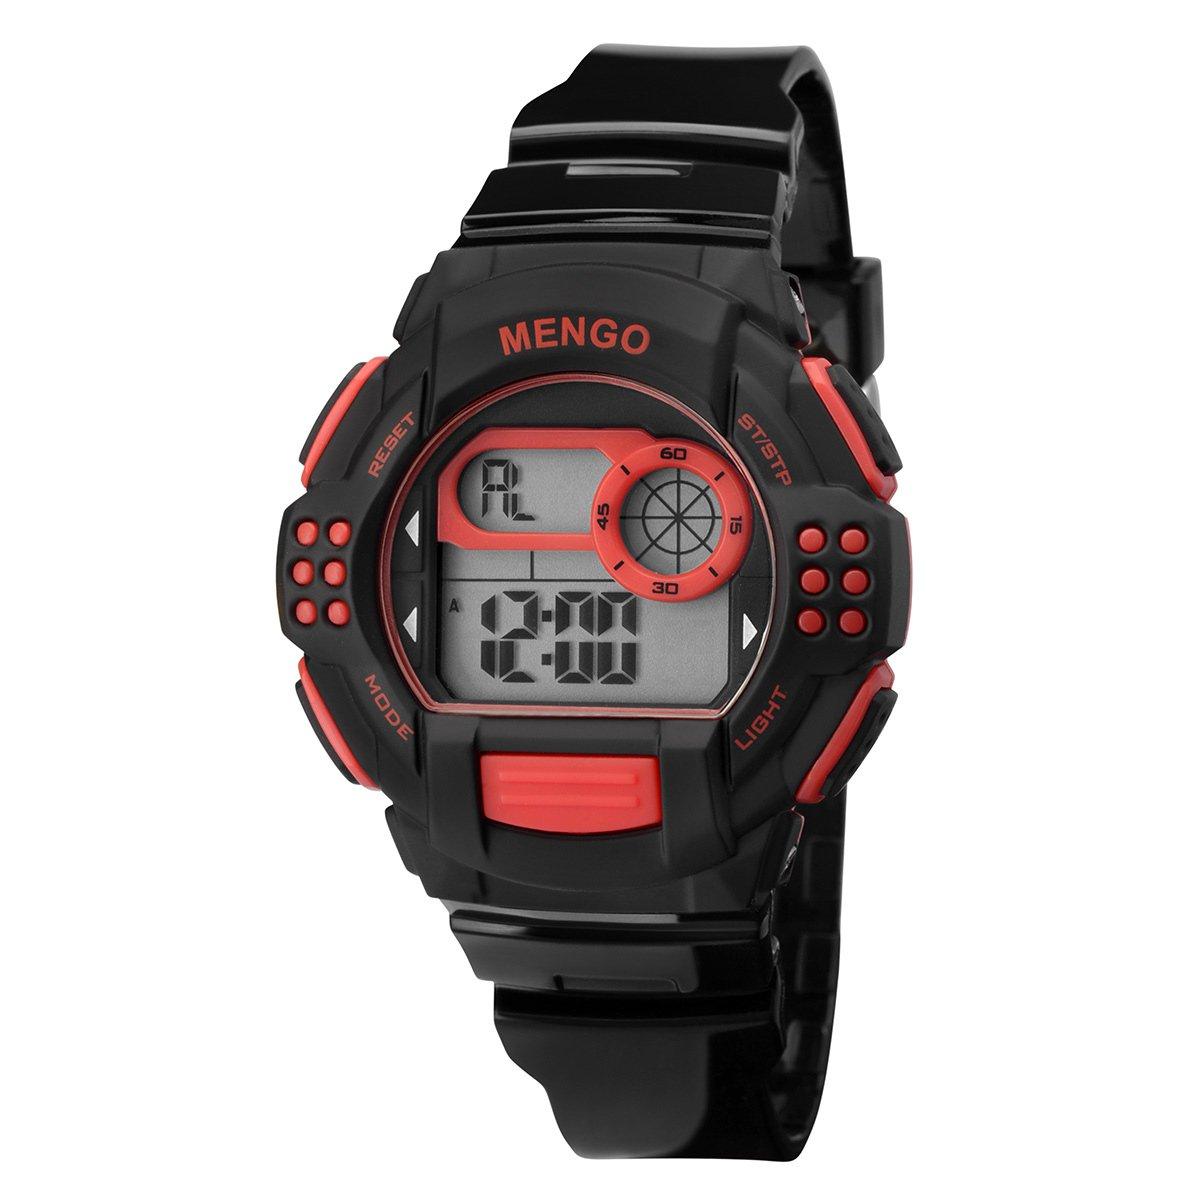 1fe2be7aac1 Relógio Flamengo Technos Digital III - Compre Agora